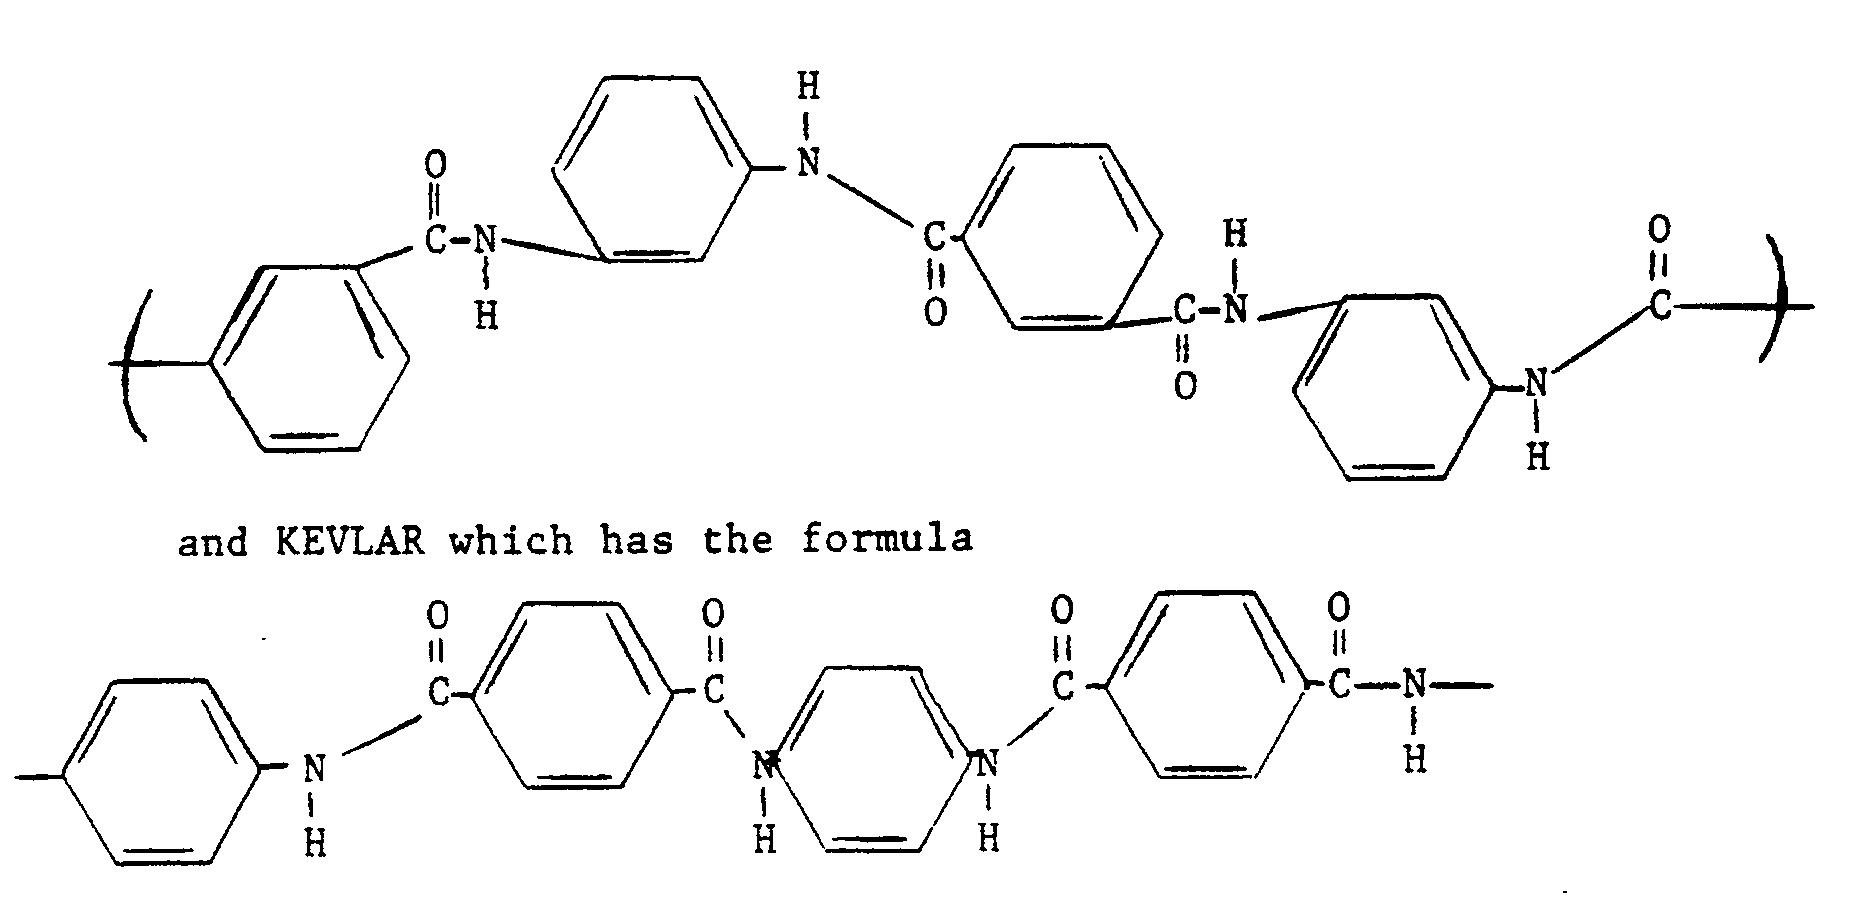 EP0251357B1 - Engineering thermoplastics containing pendant  benzocyclobutene groups - Google Patents